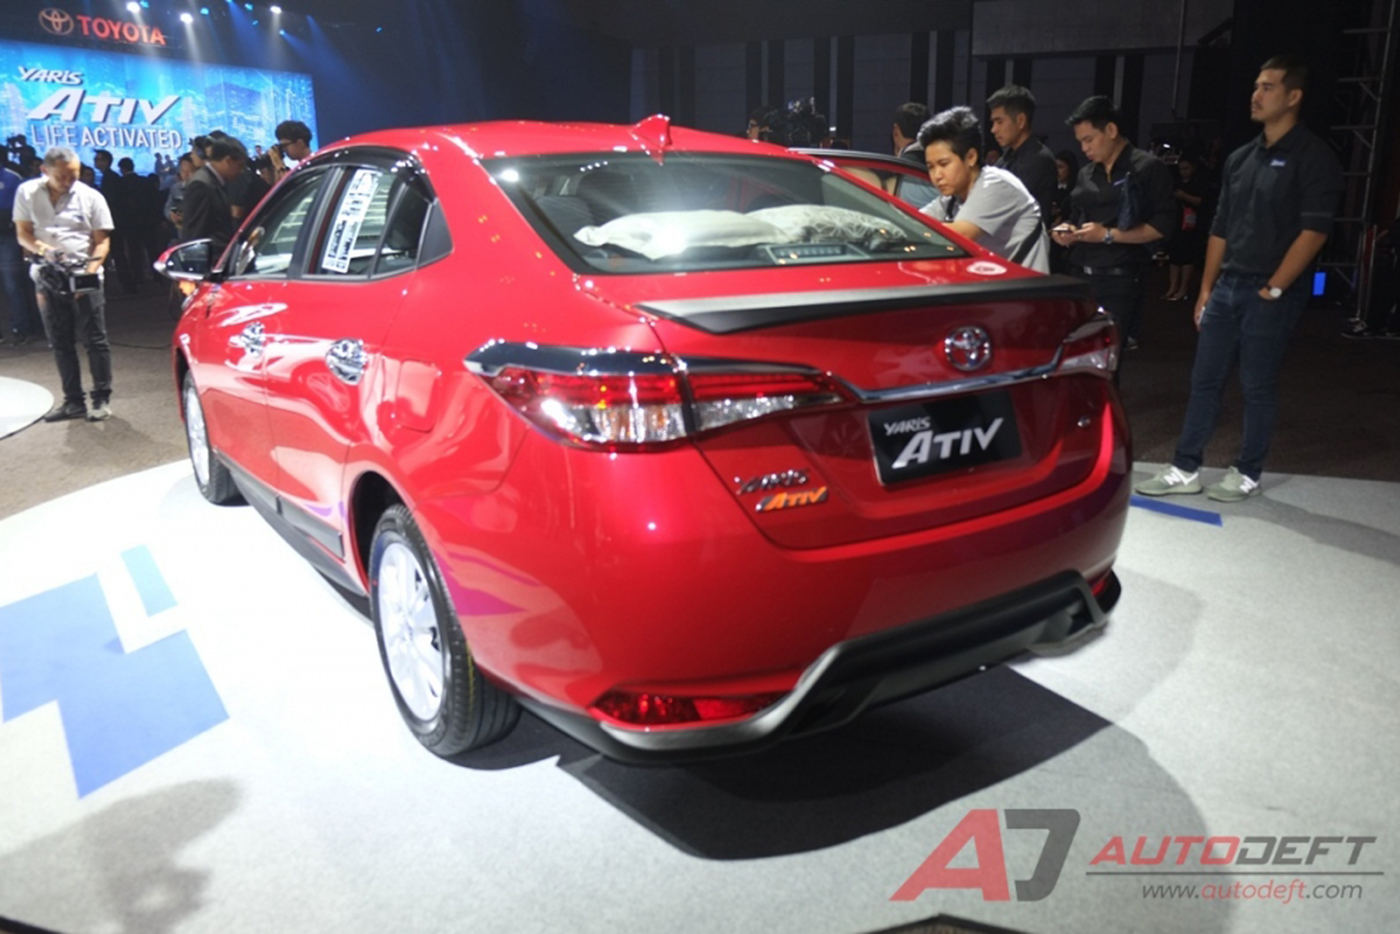 toyota-yaris-sedan-2018-24.jpg